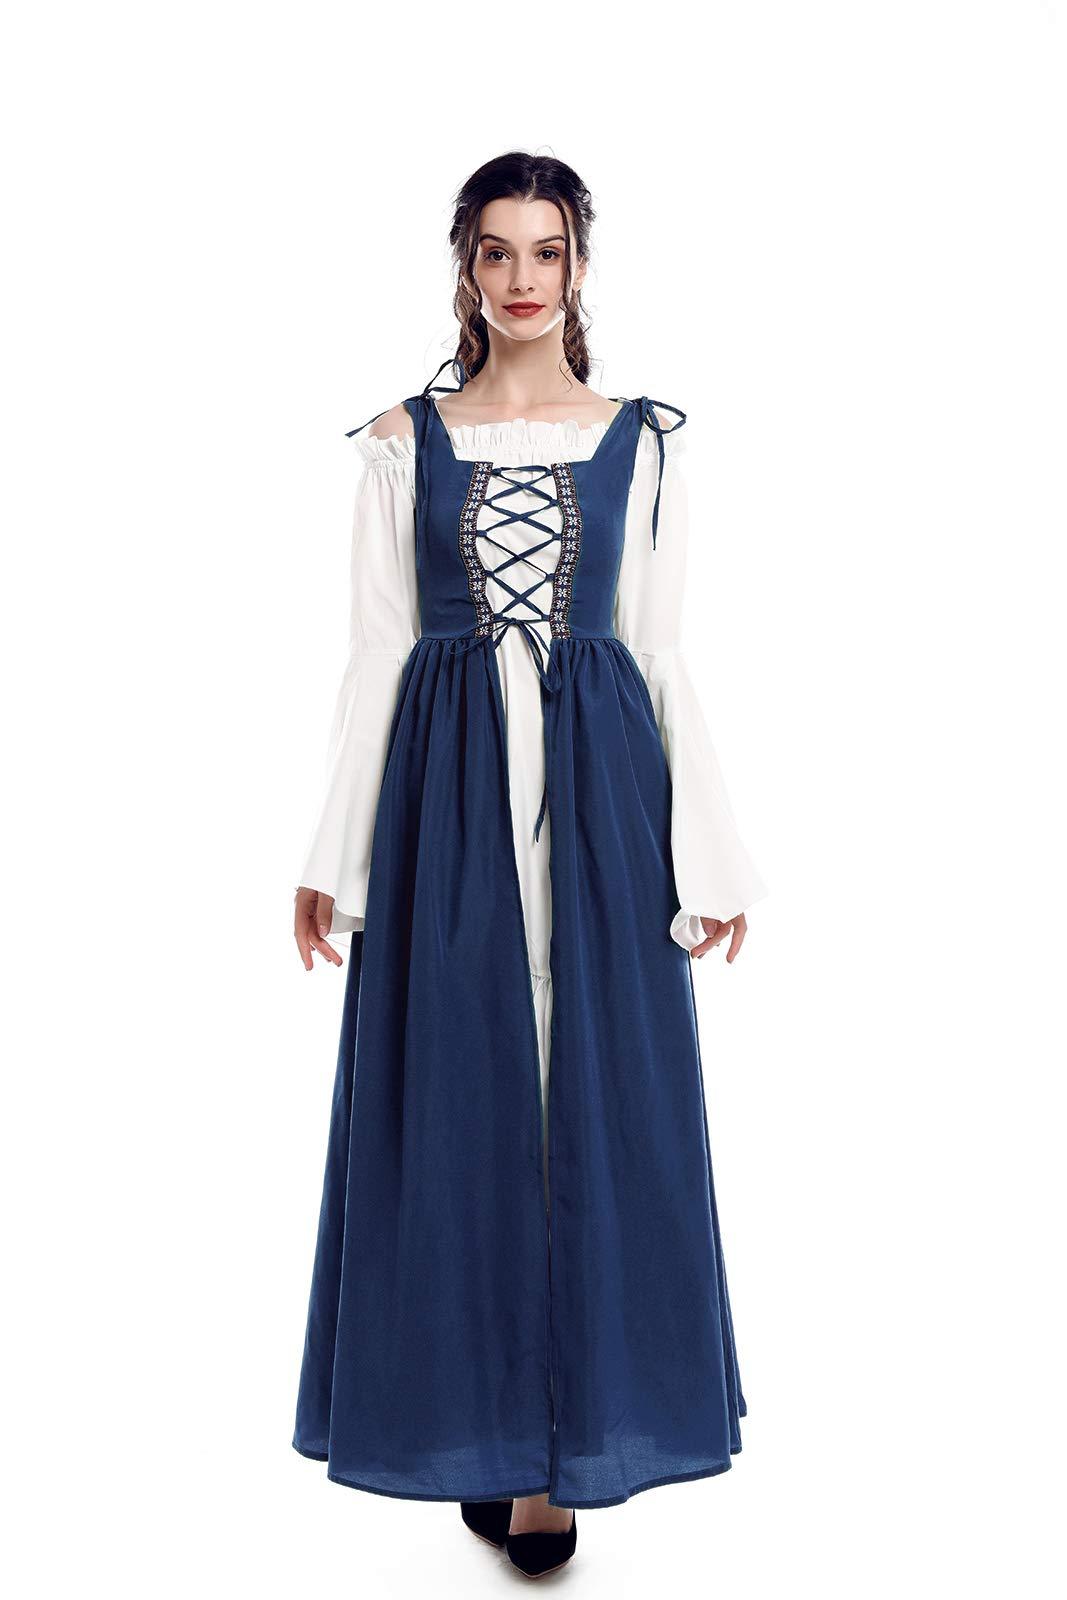 ab0fdfbc6944 ROLECOS Irish Renaissance Costume Womens Medieval Over Dress and Chemise  Boho Set Navy Blue XXL/3XL